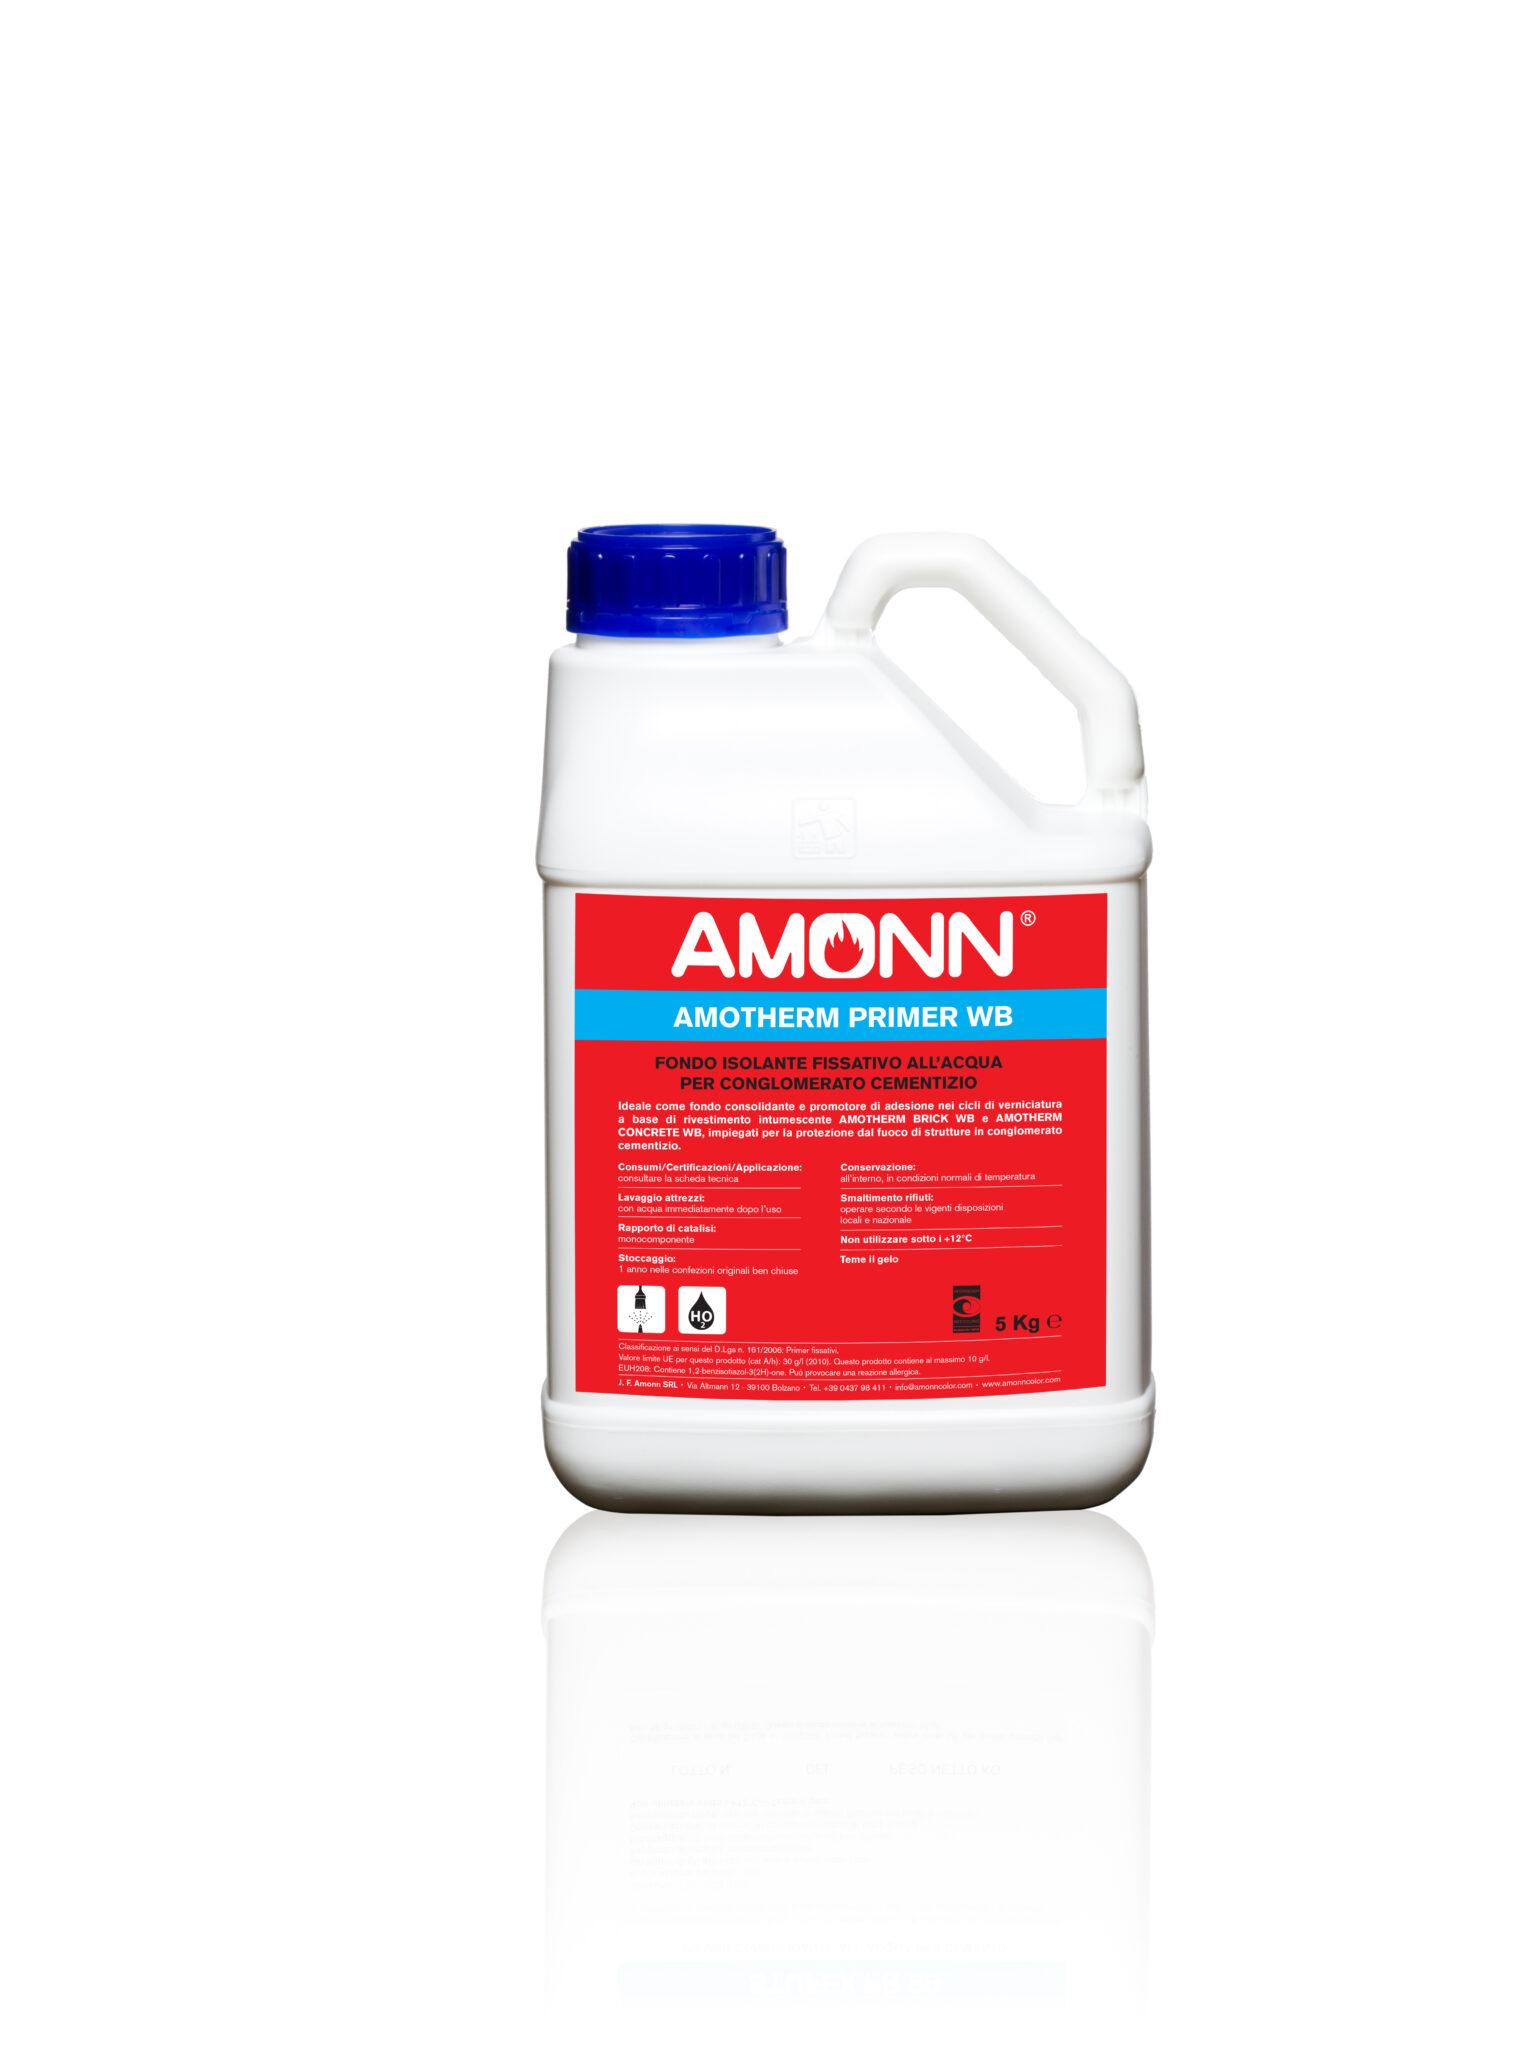 Amotherm Primer WB